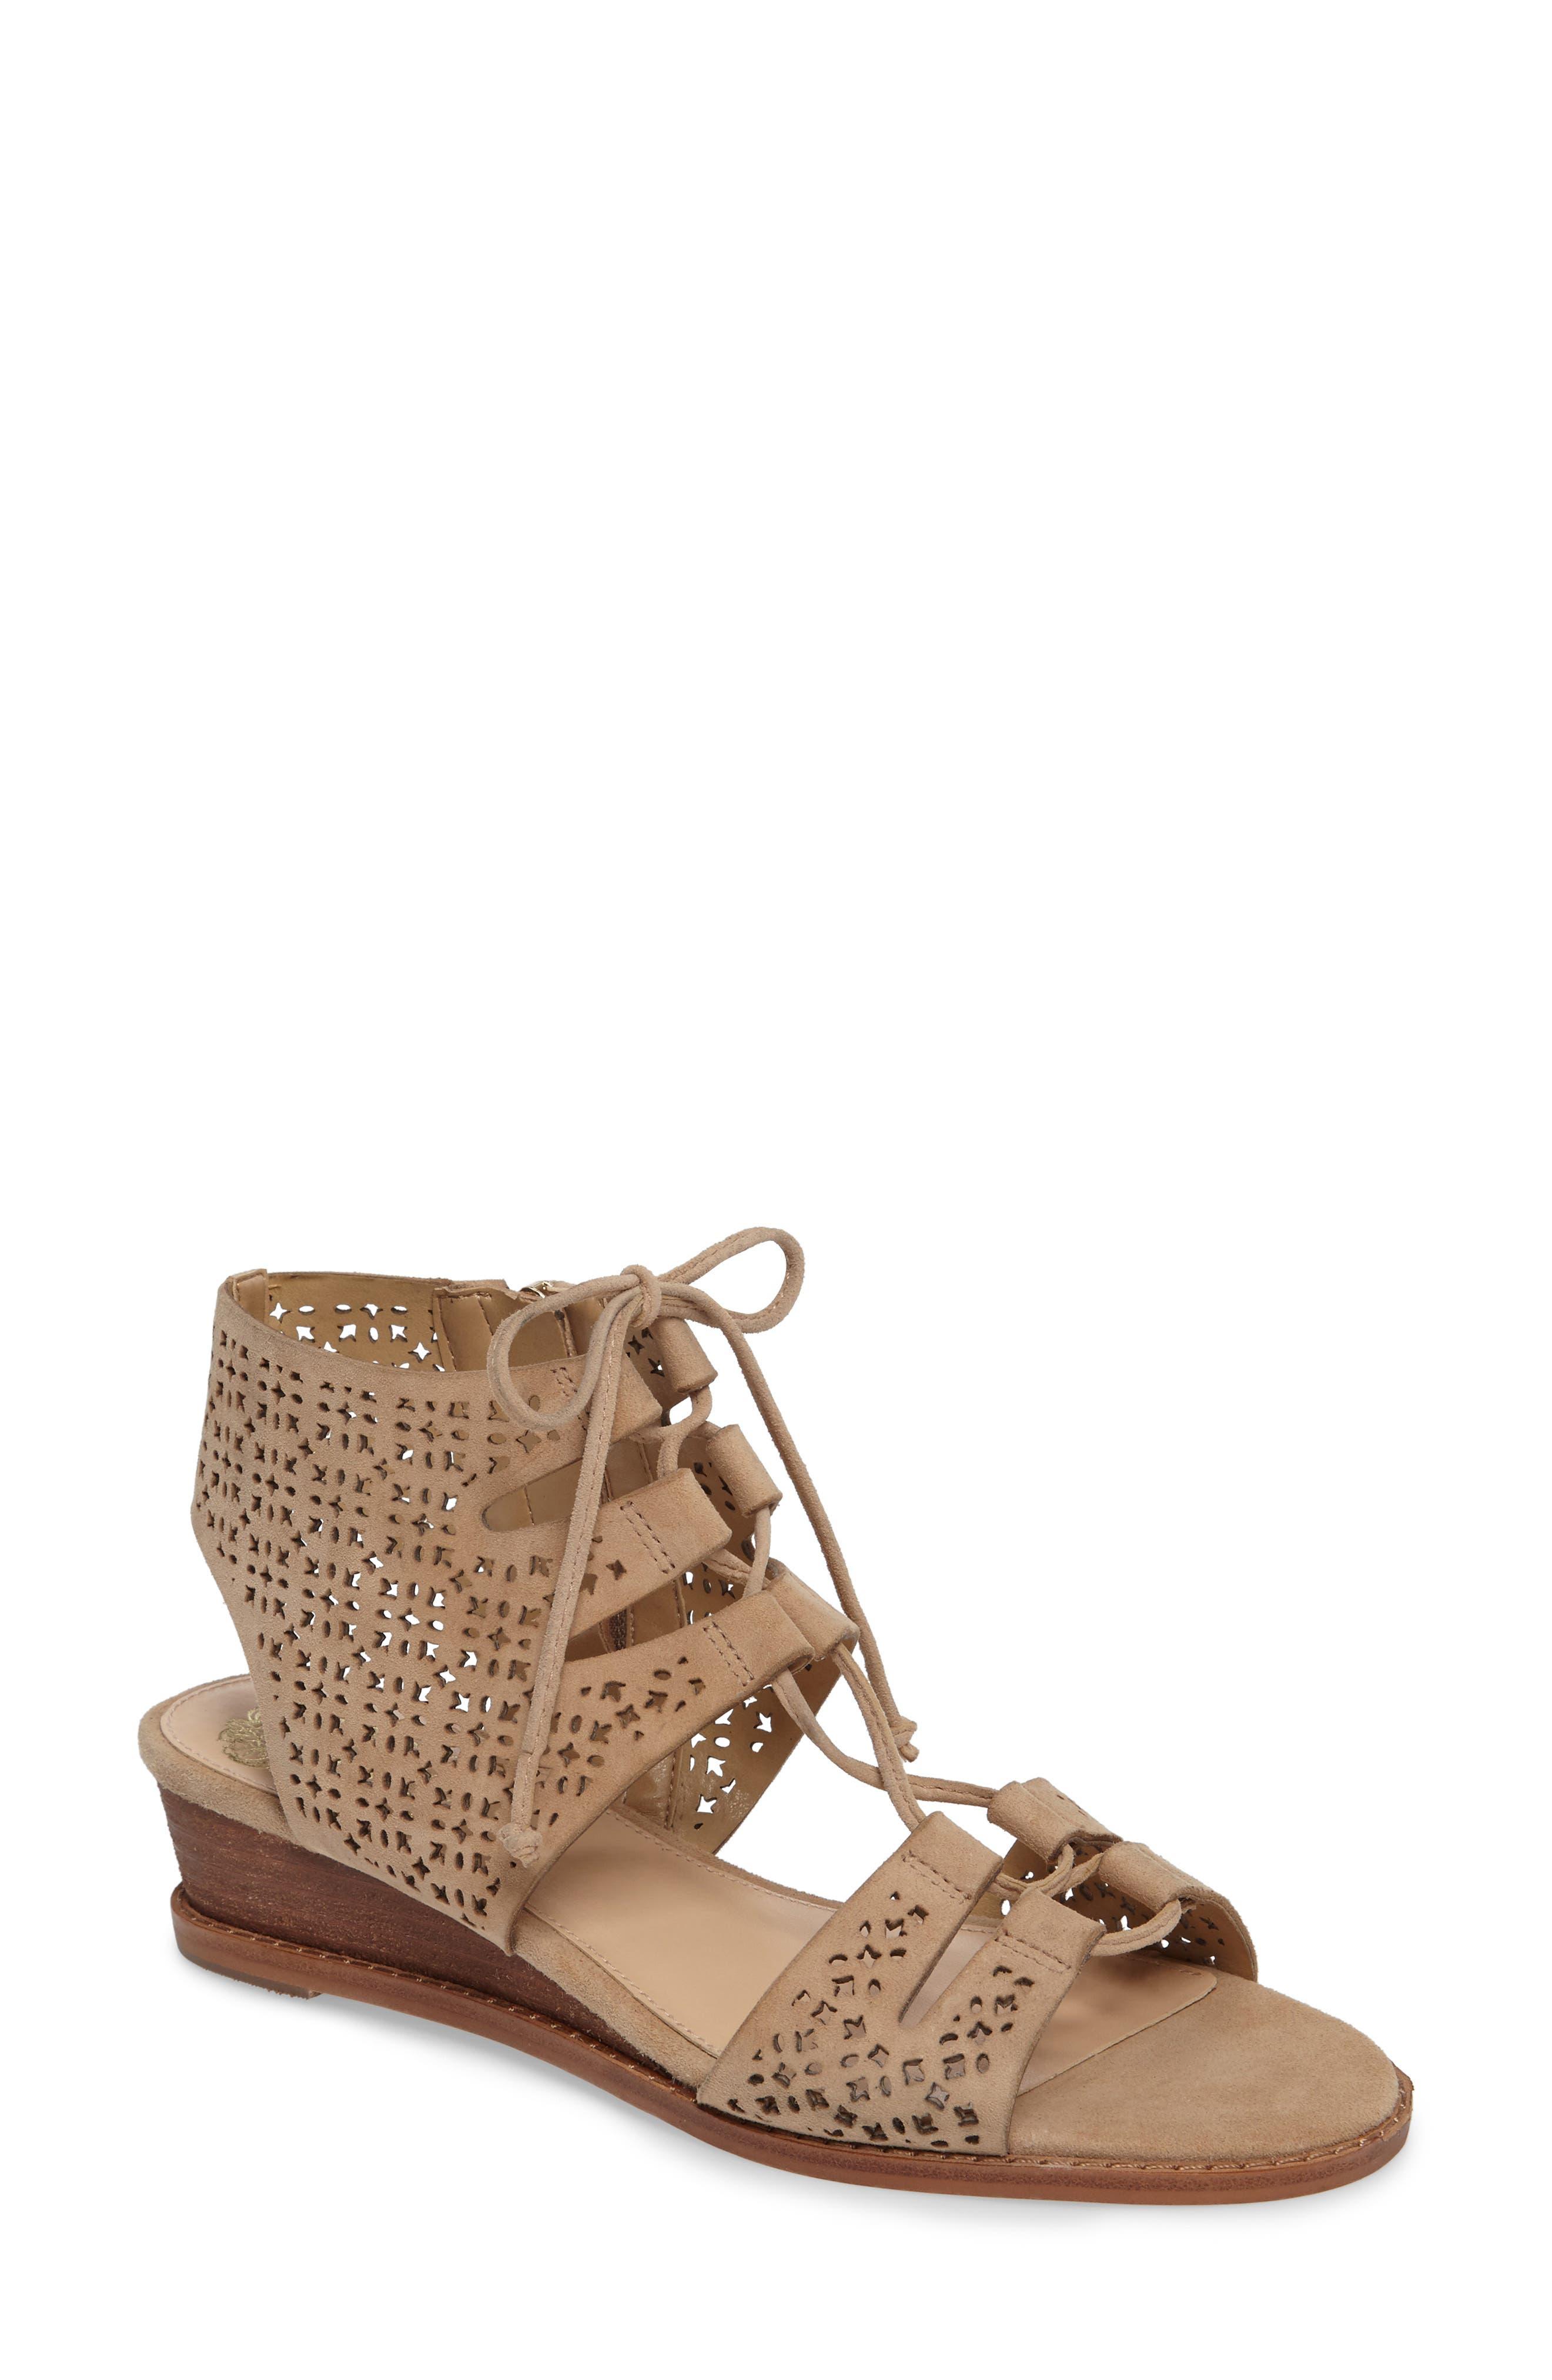 VINCE CAMUTO Retana Perforated Wedge Sandal